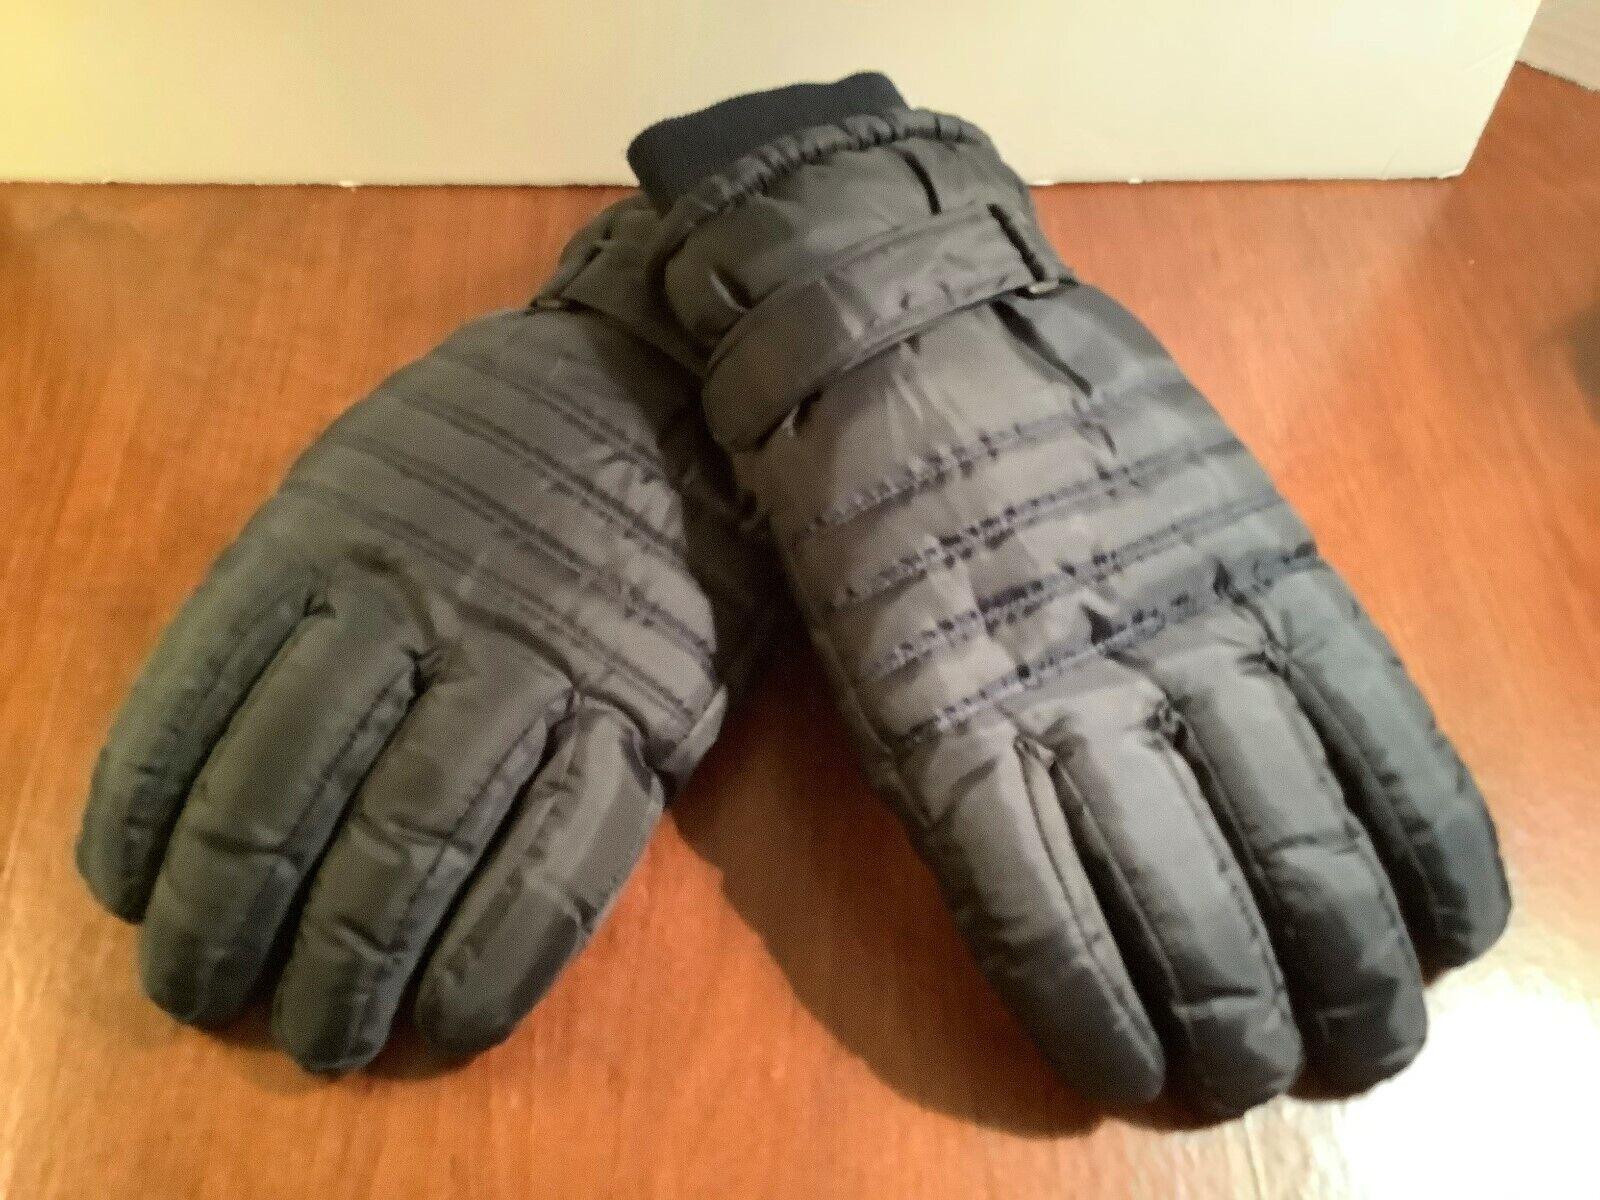 Mens Insulated Winter Ski Gloves Black Waterproof Nonslip Grip